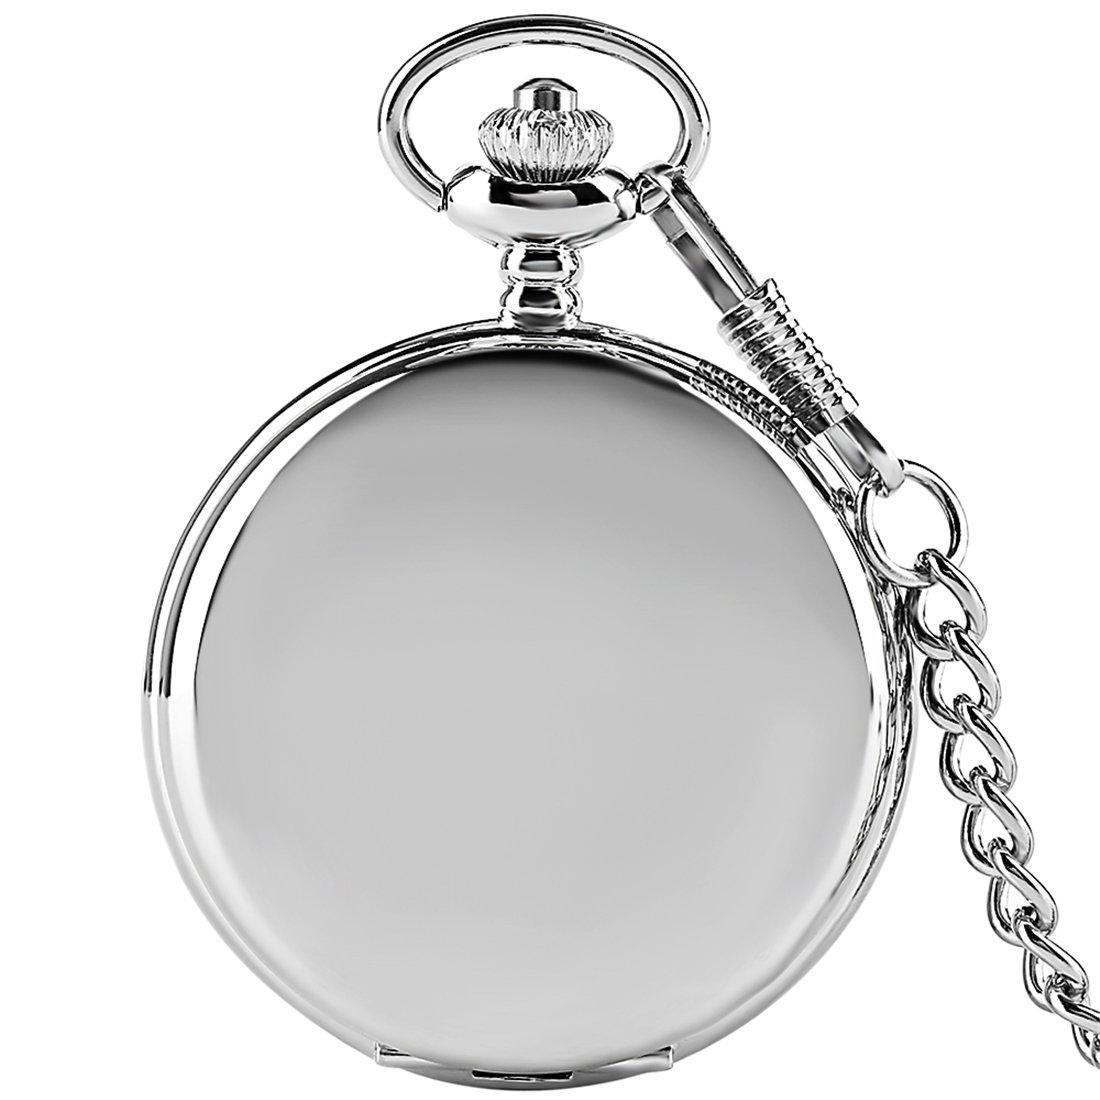 Silver Smooth Surface Quartz Pocket Watch Fob Chain Steampunk White Dial